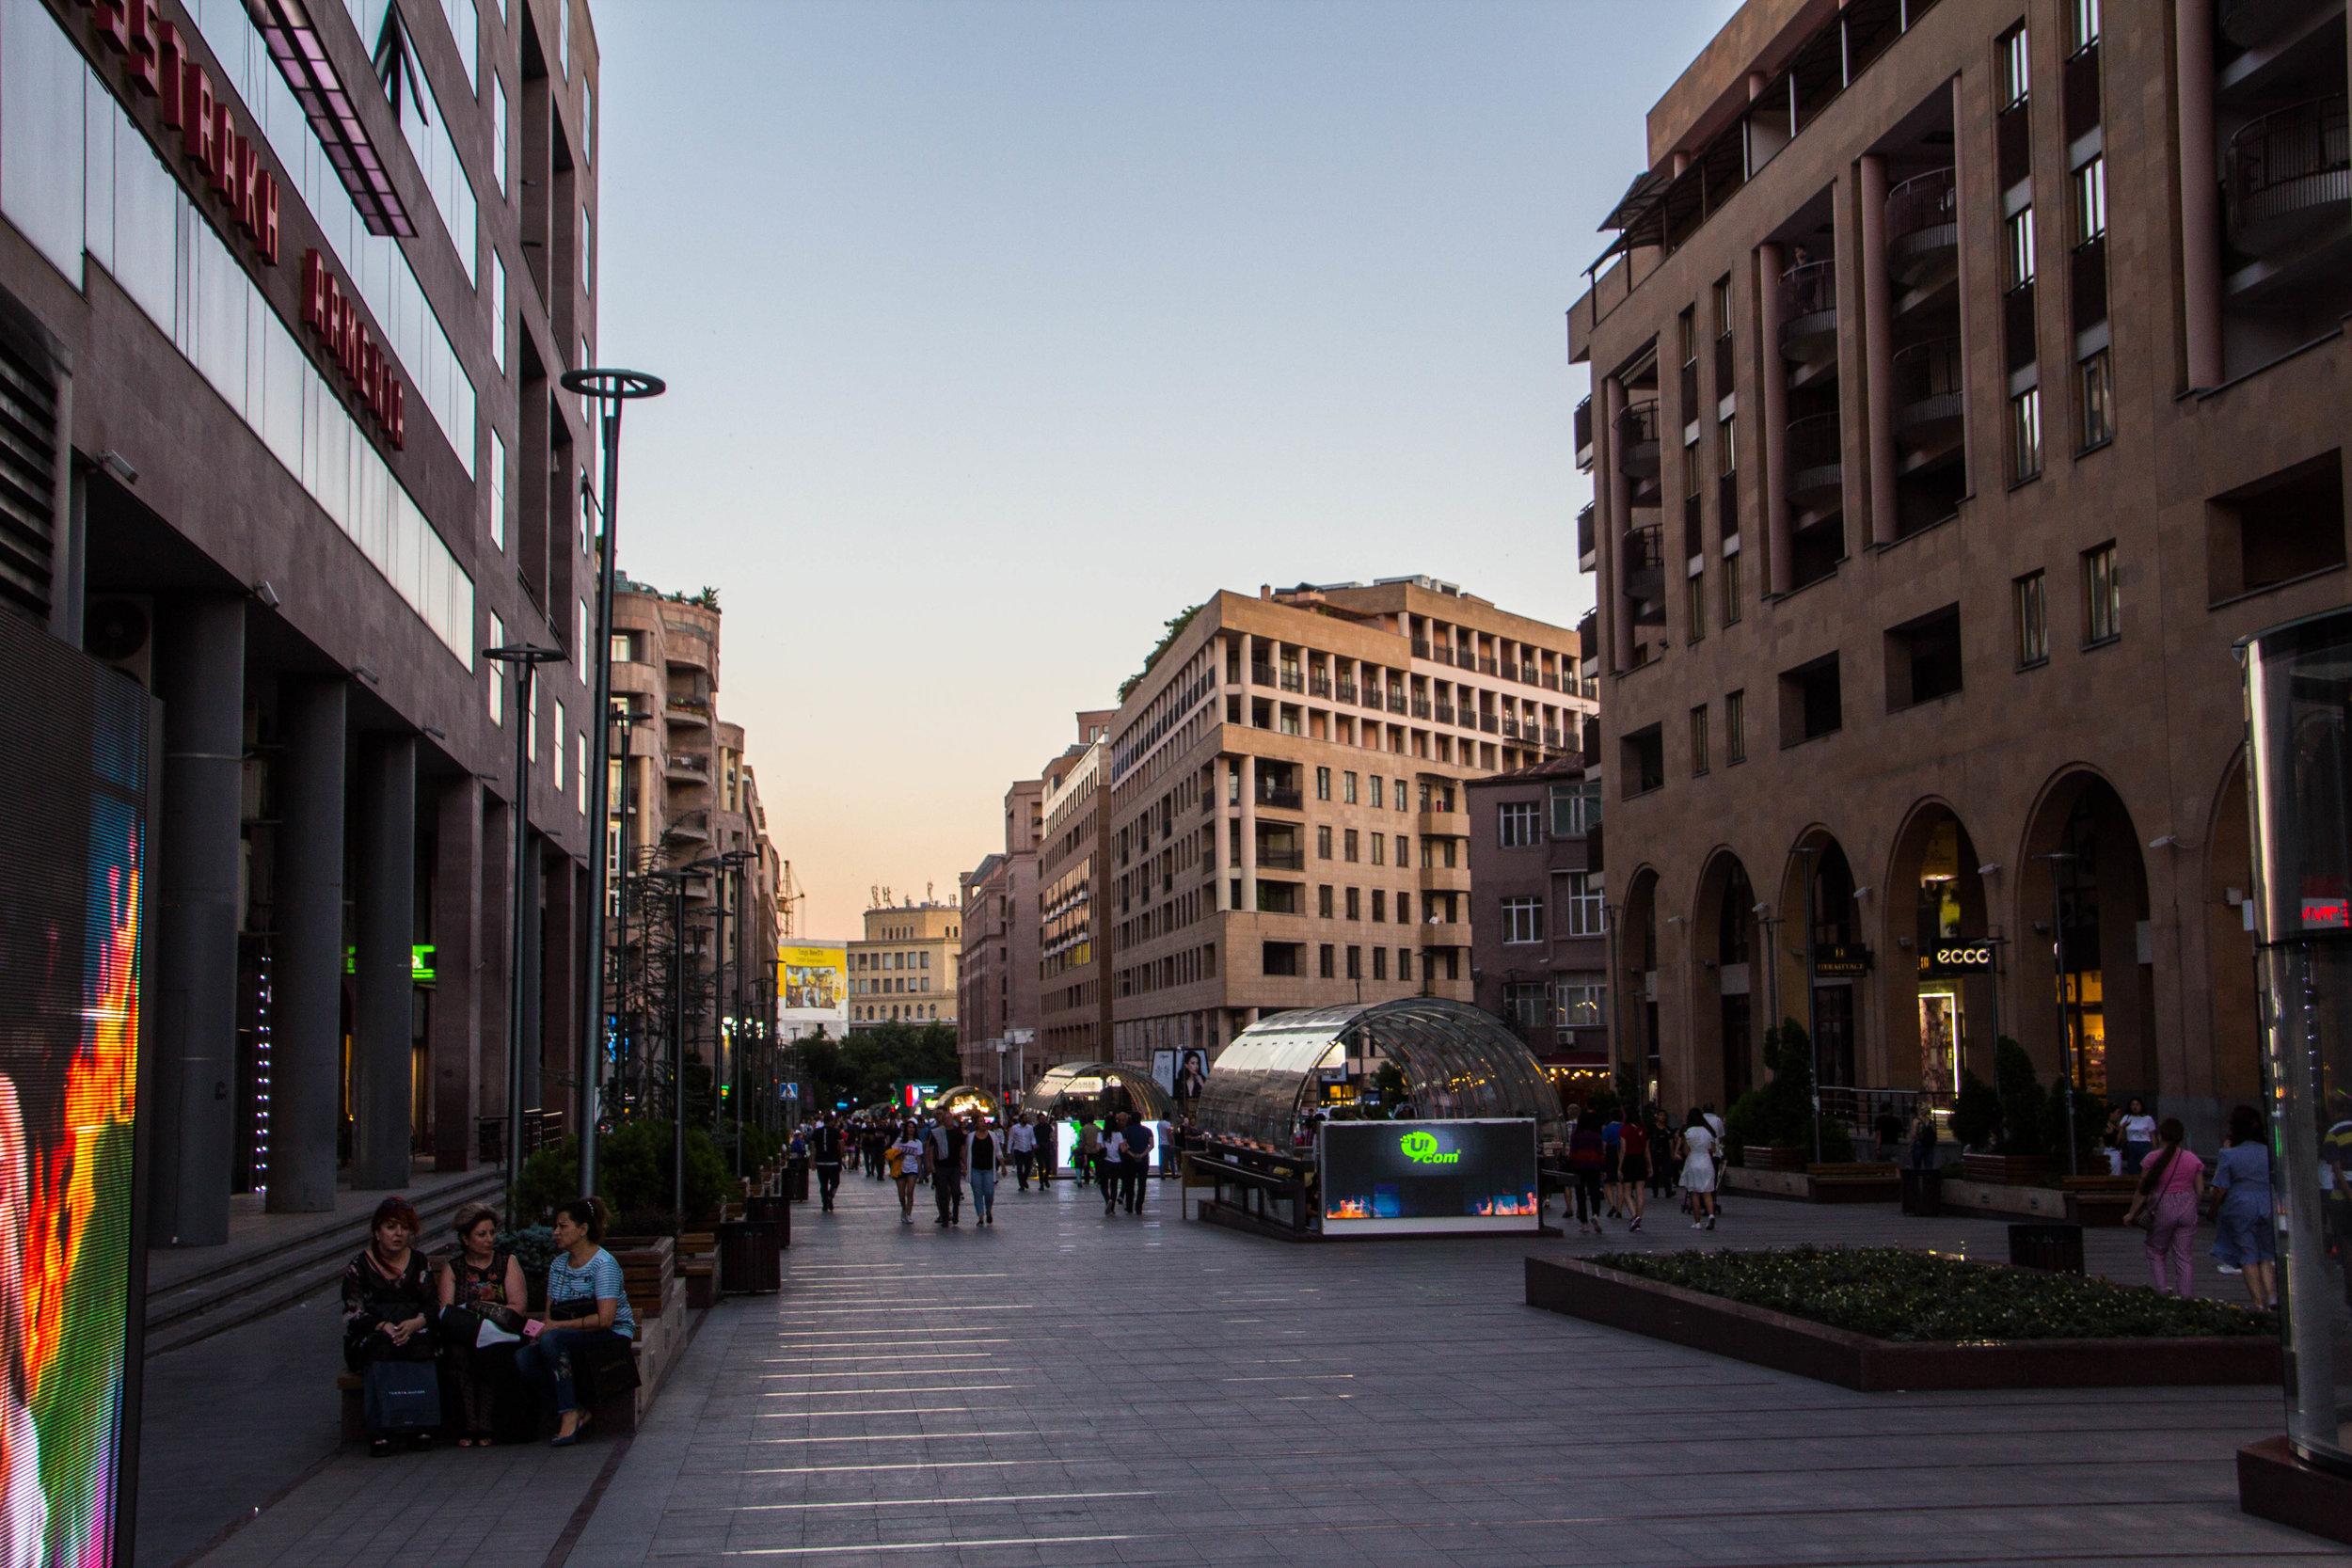 yerevan-armenia-streets-3-11.jpg